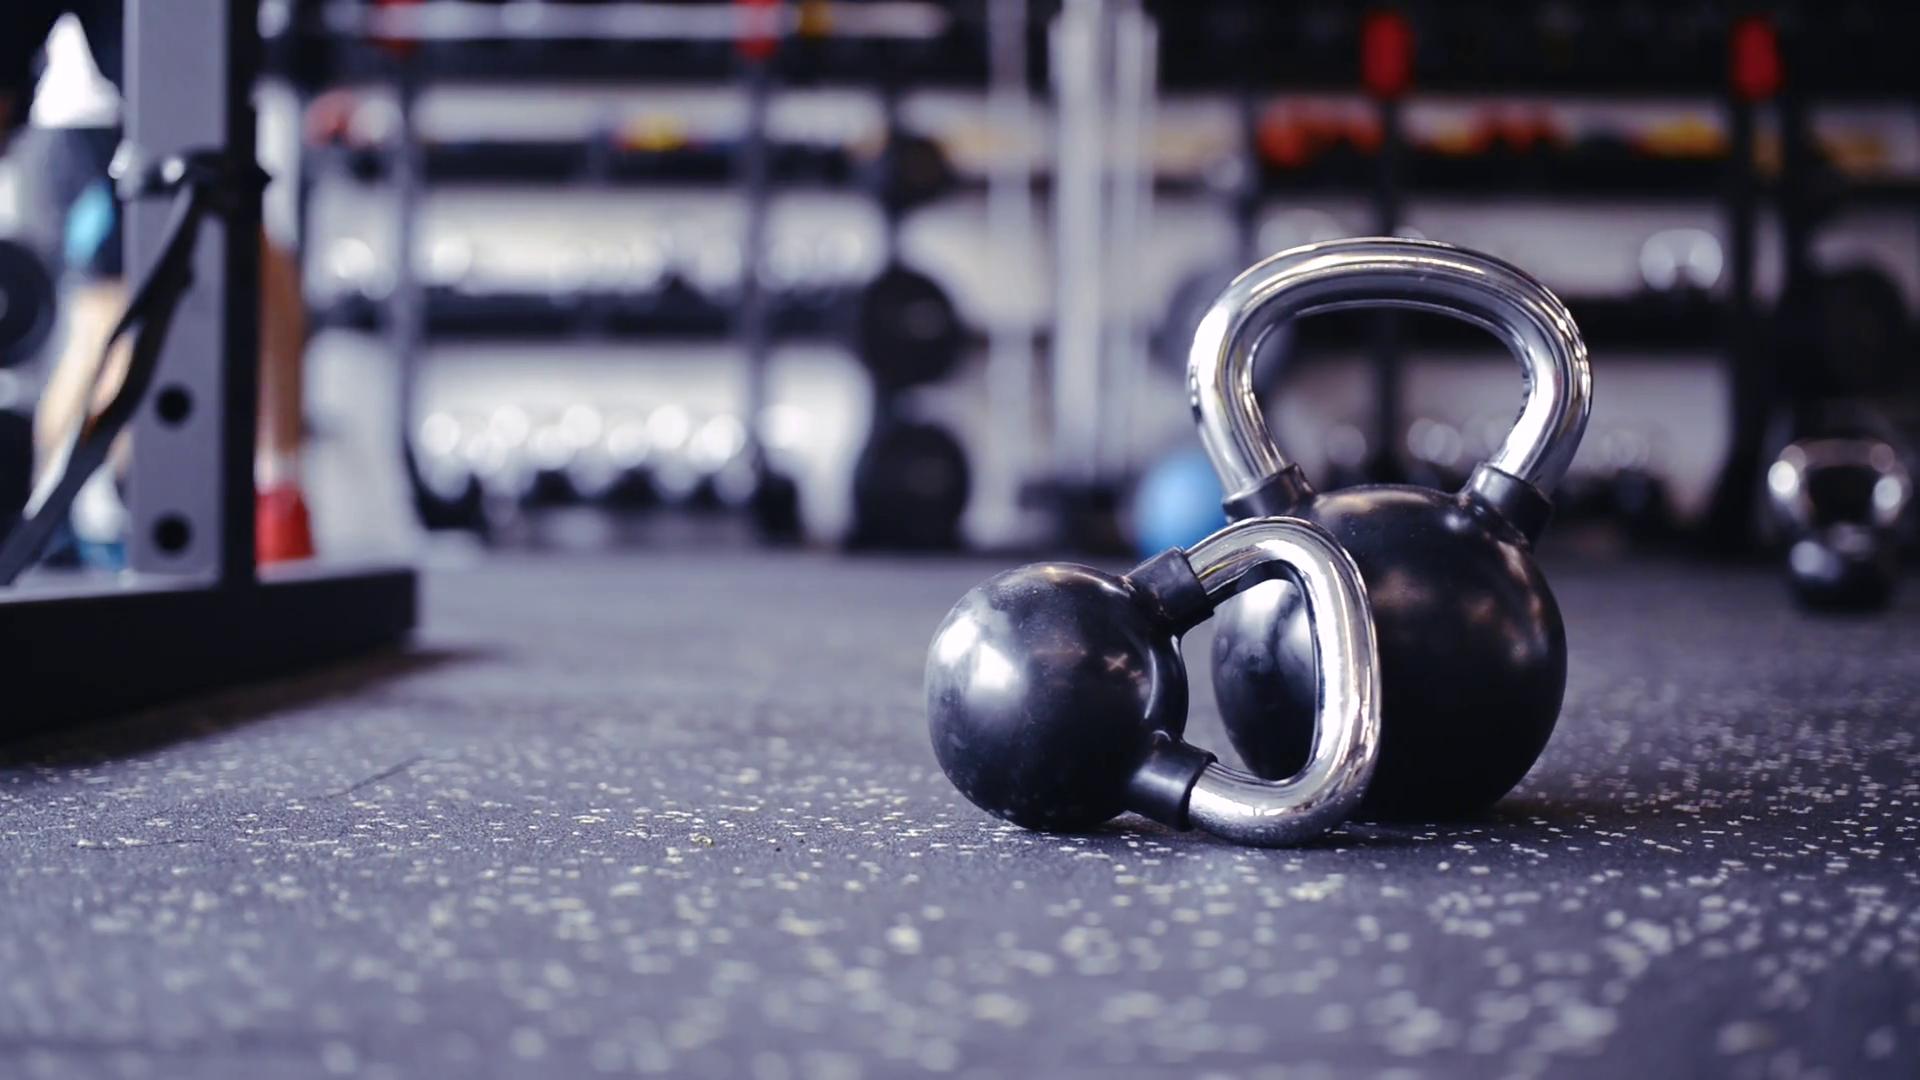 videoblocks-pair-of-kettlebells-laid-on-the-floor-in-gym_ssncefuz_thumbnail-full01